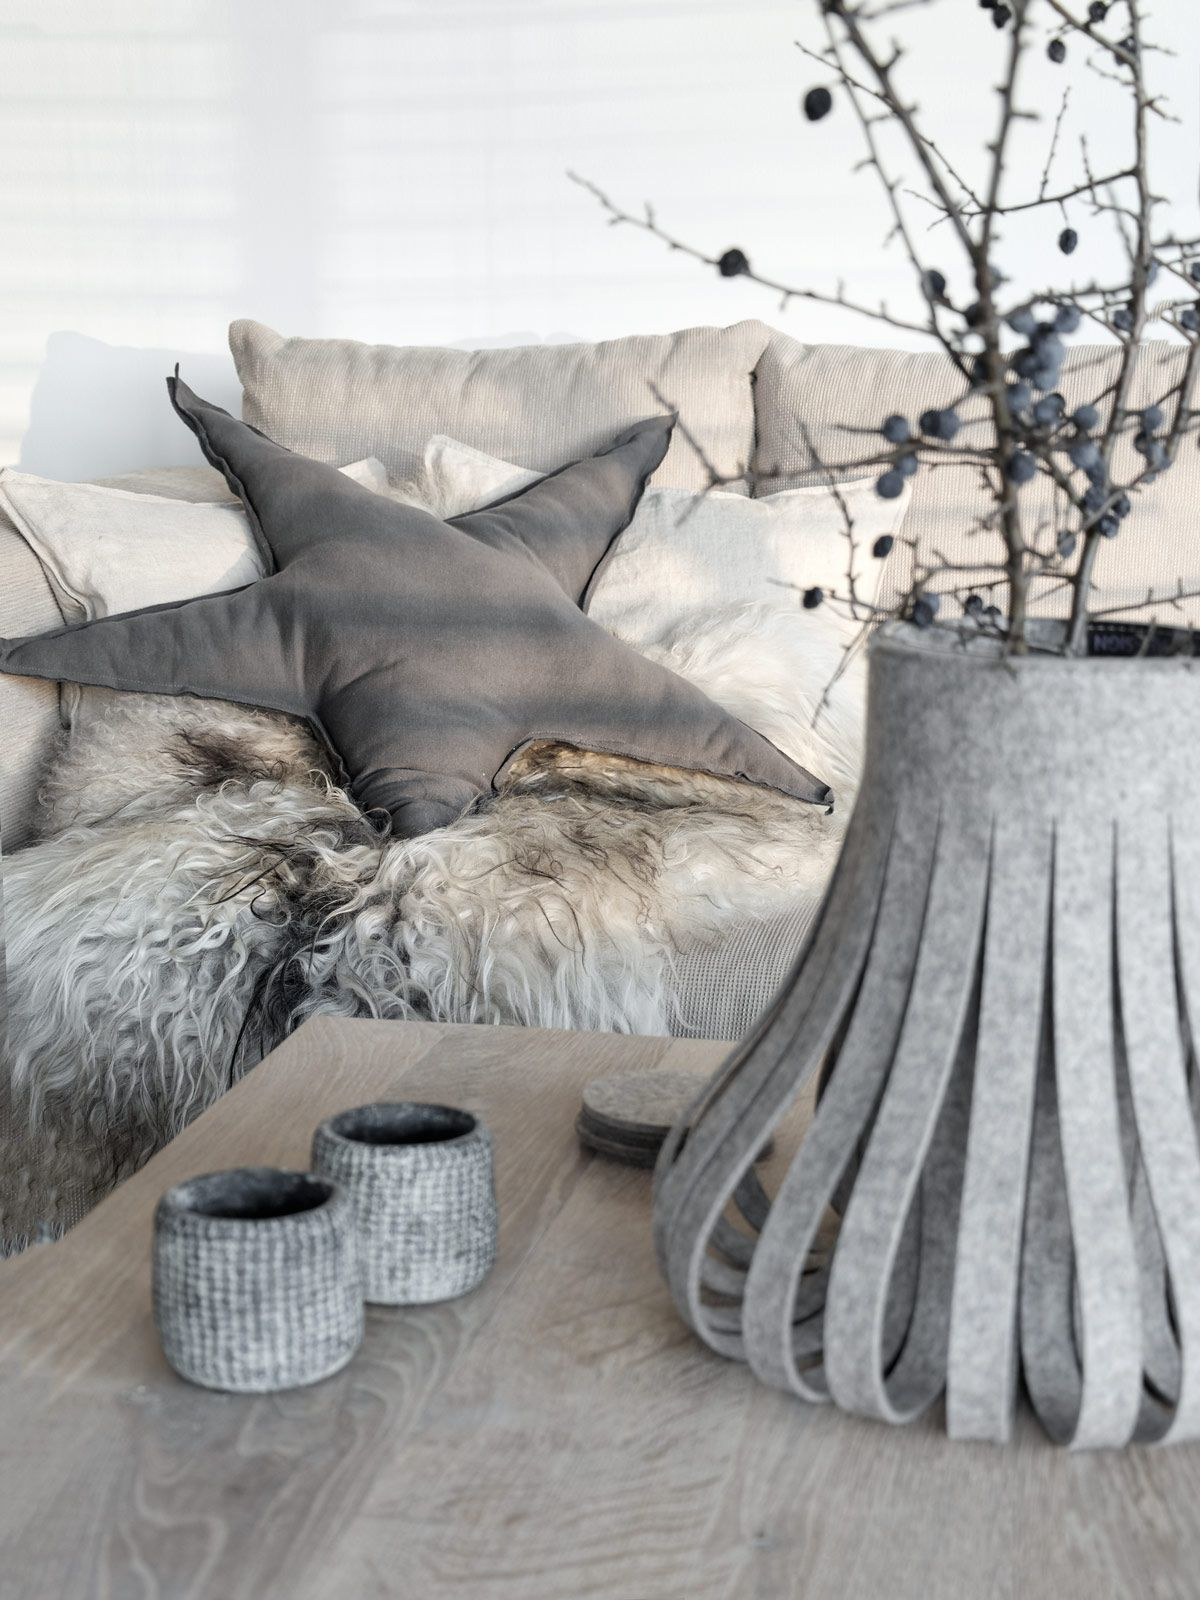 sternkissen aus jersey selber naehen mx living diy pinterest sternkissen selber n hen. Black Bedroom Furniture Sets. Home Design Ideas